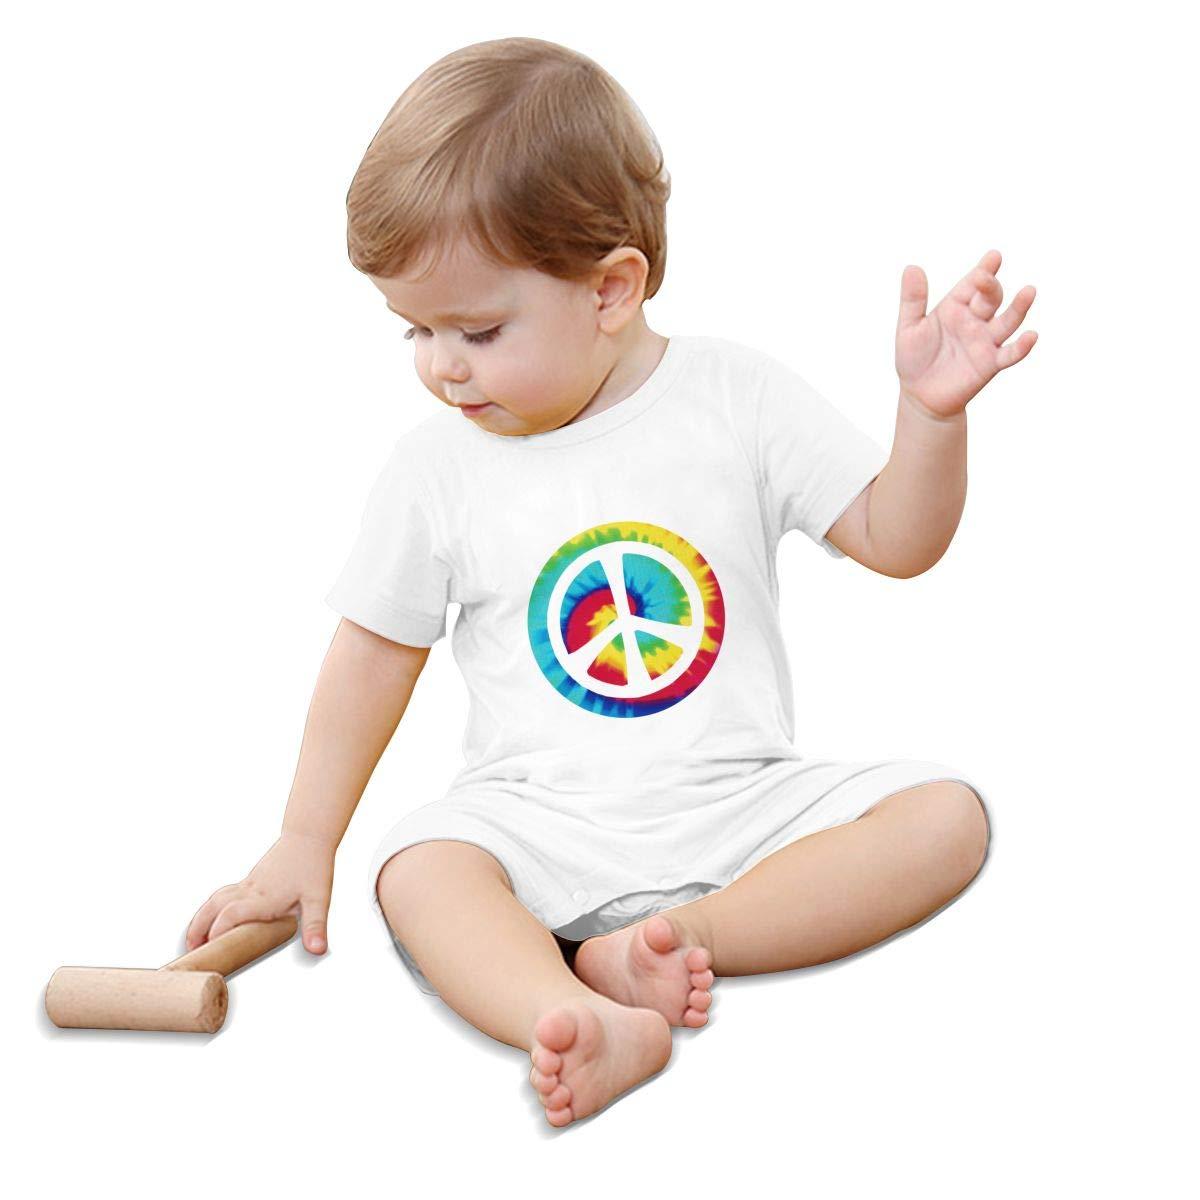 A1BY-5US Newborn Infant Baby Girls Boys Romper Jumpsuit Tie Dye Peace Sign Cotton Short Sleeve Romper Bodysuit